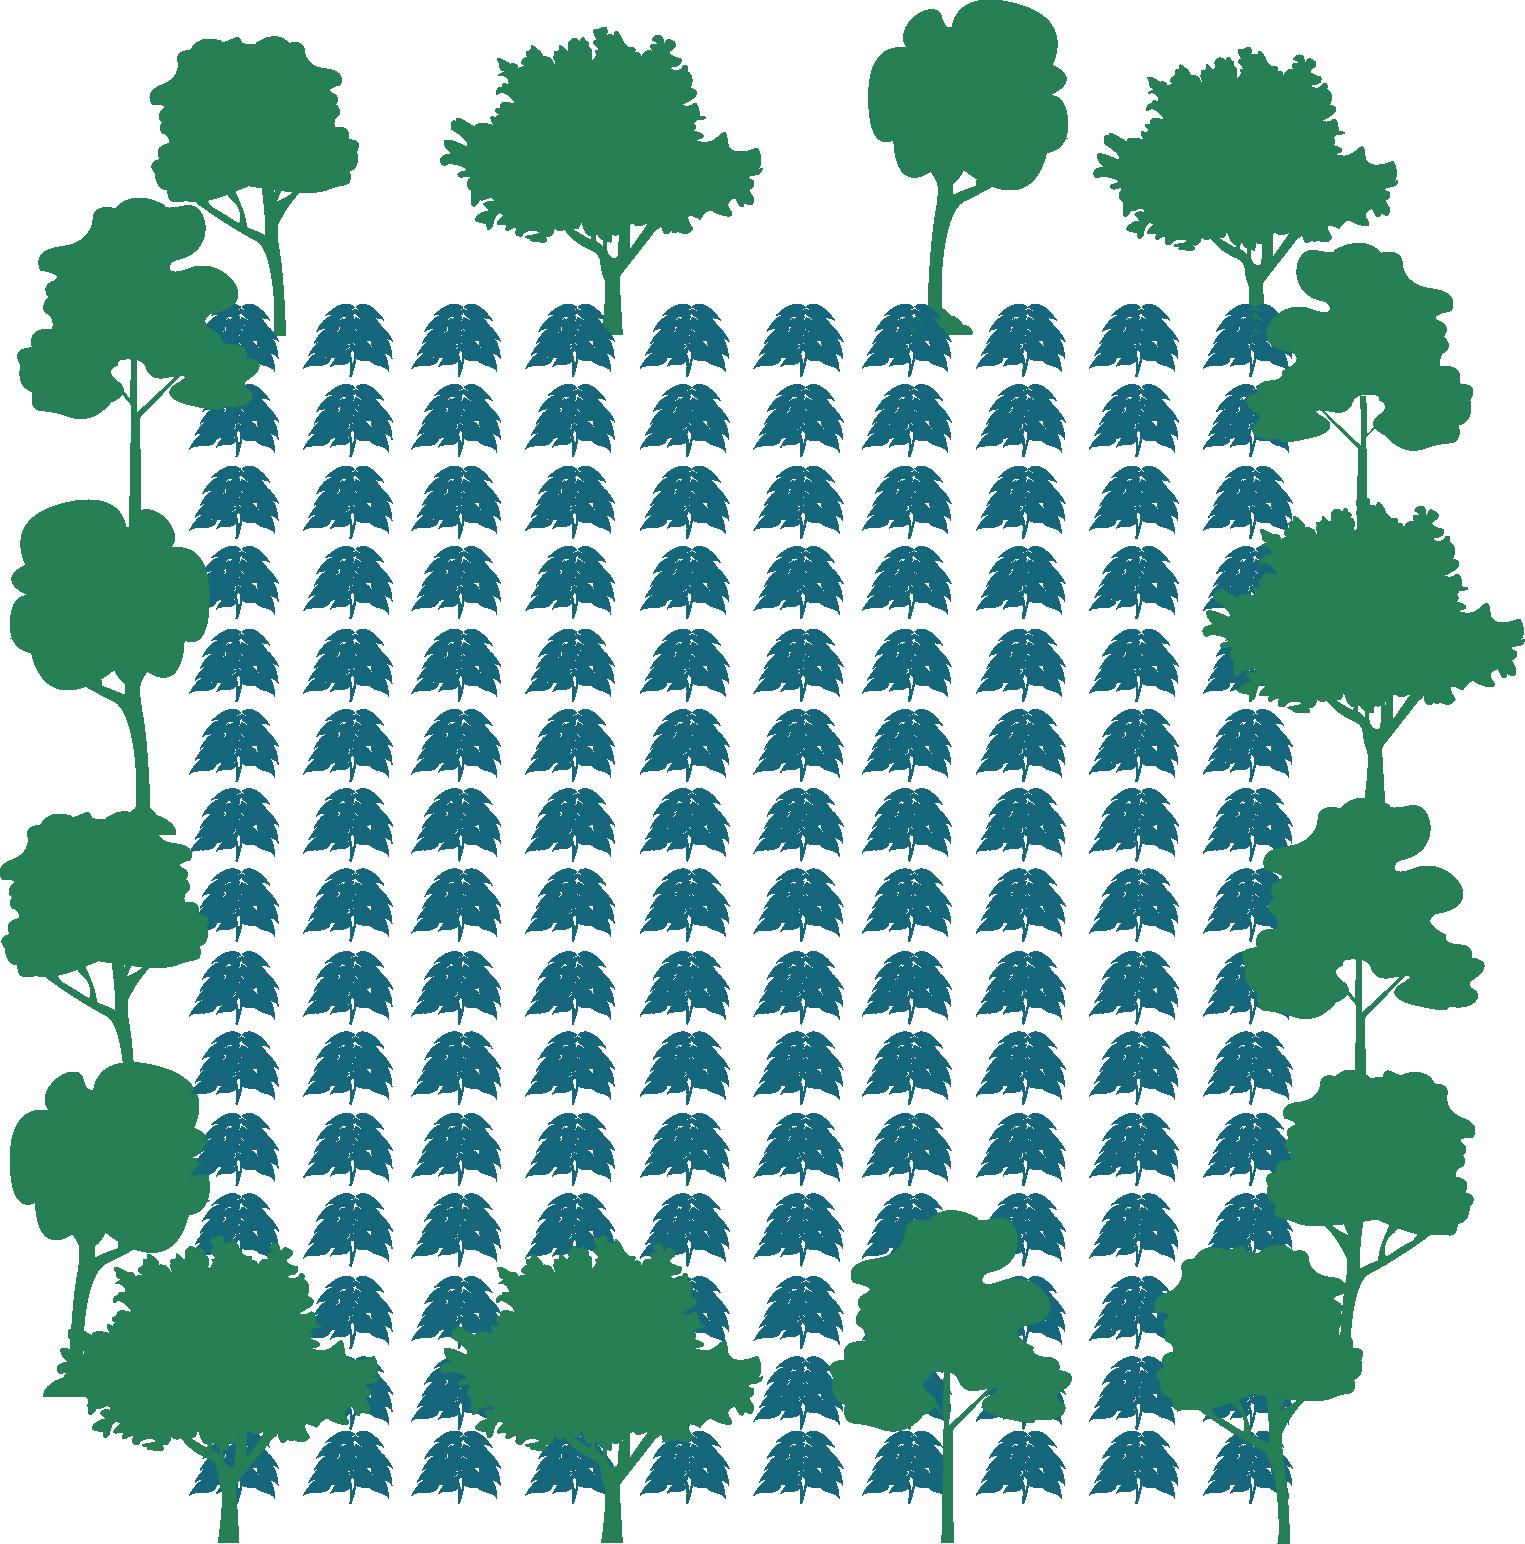 Nordesta pur projetpur projet. Growth clipart tree plantation